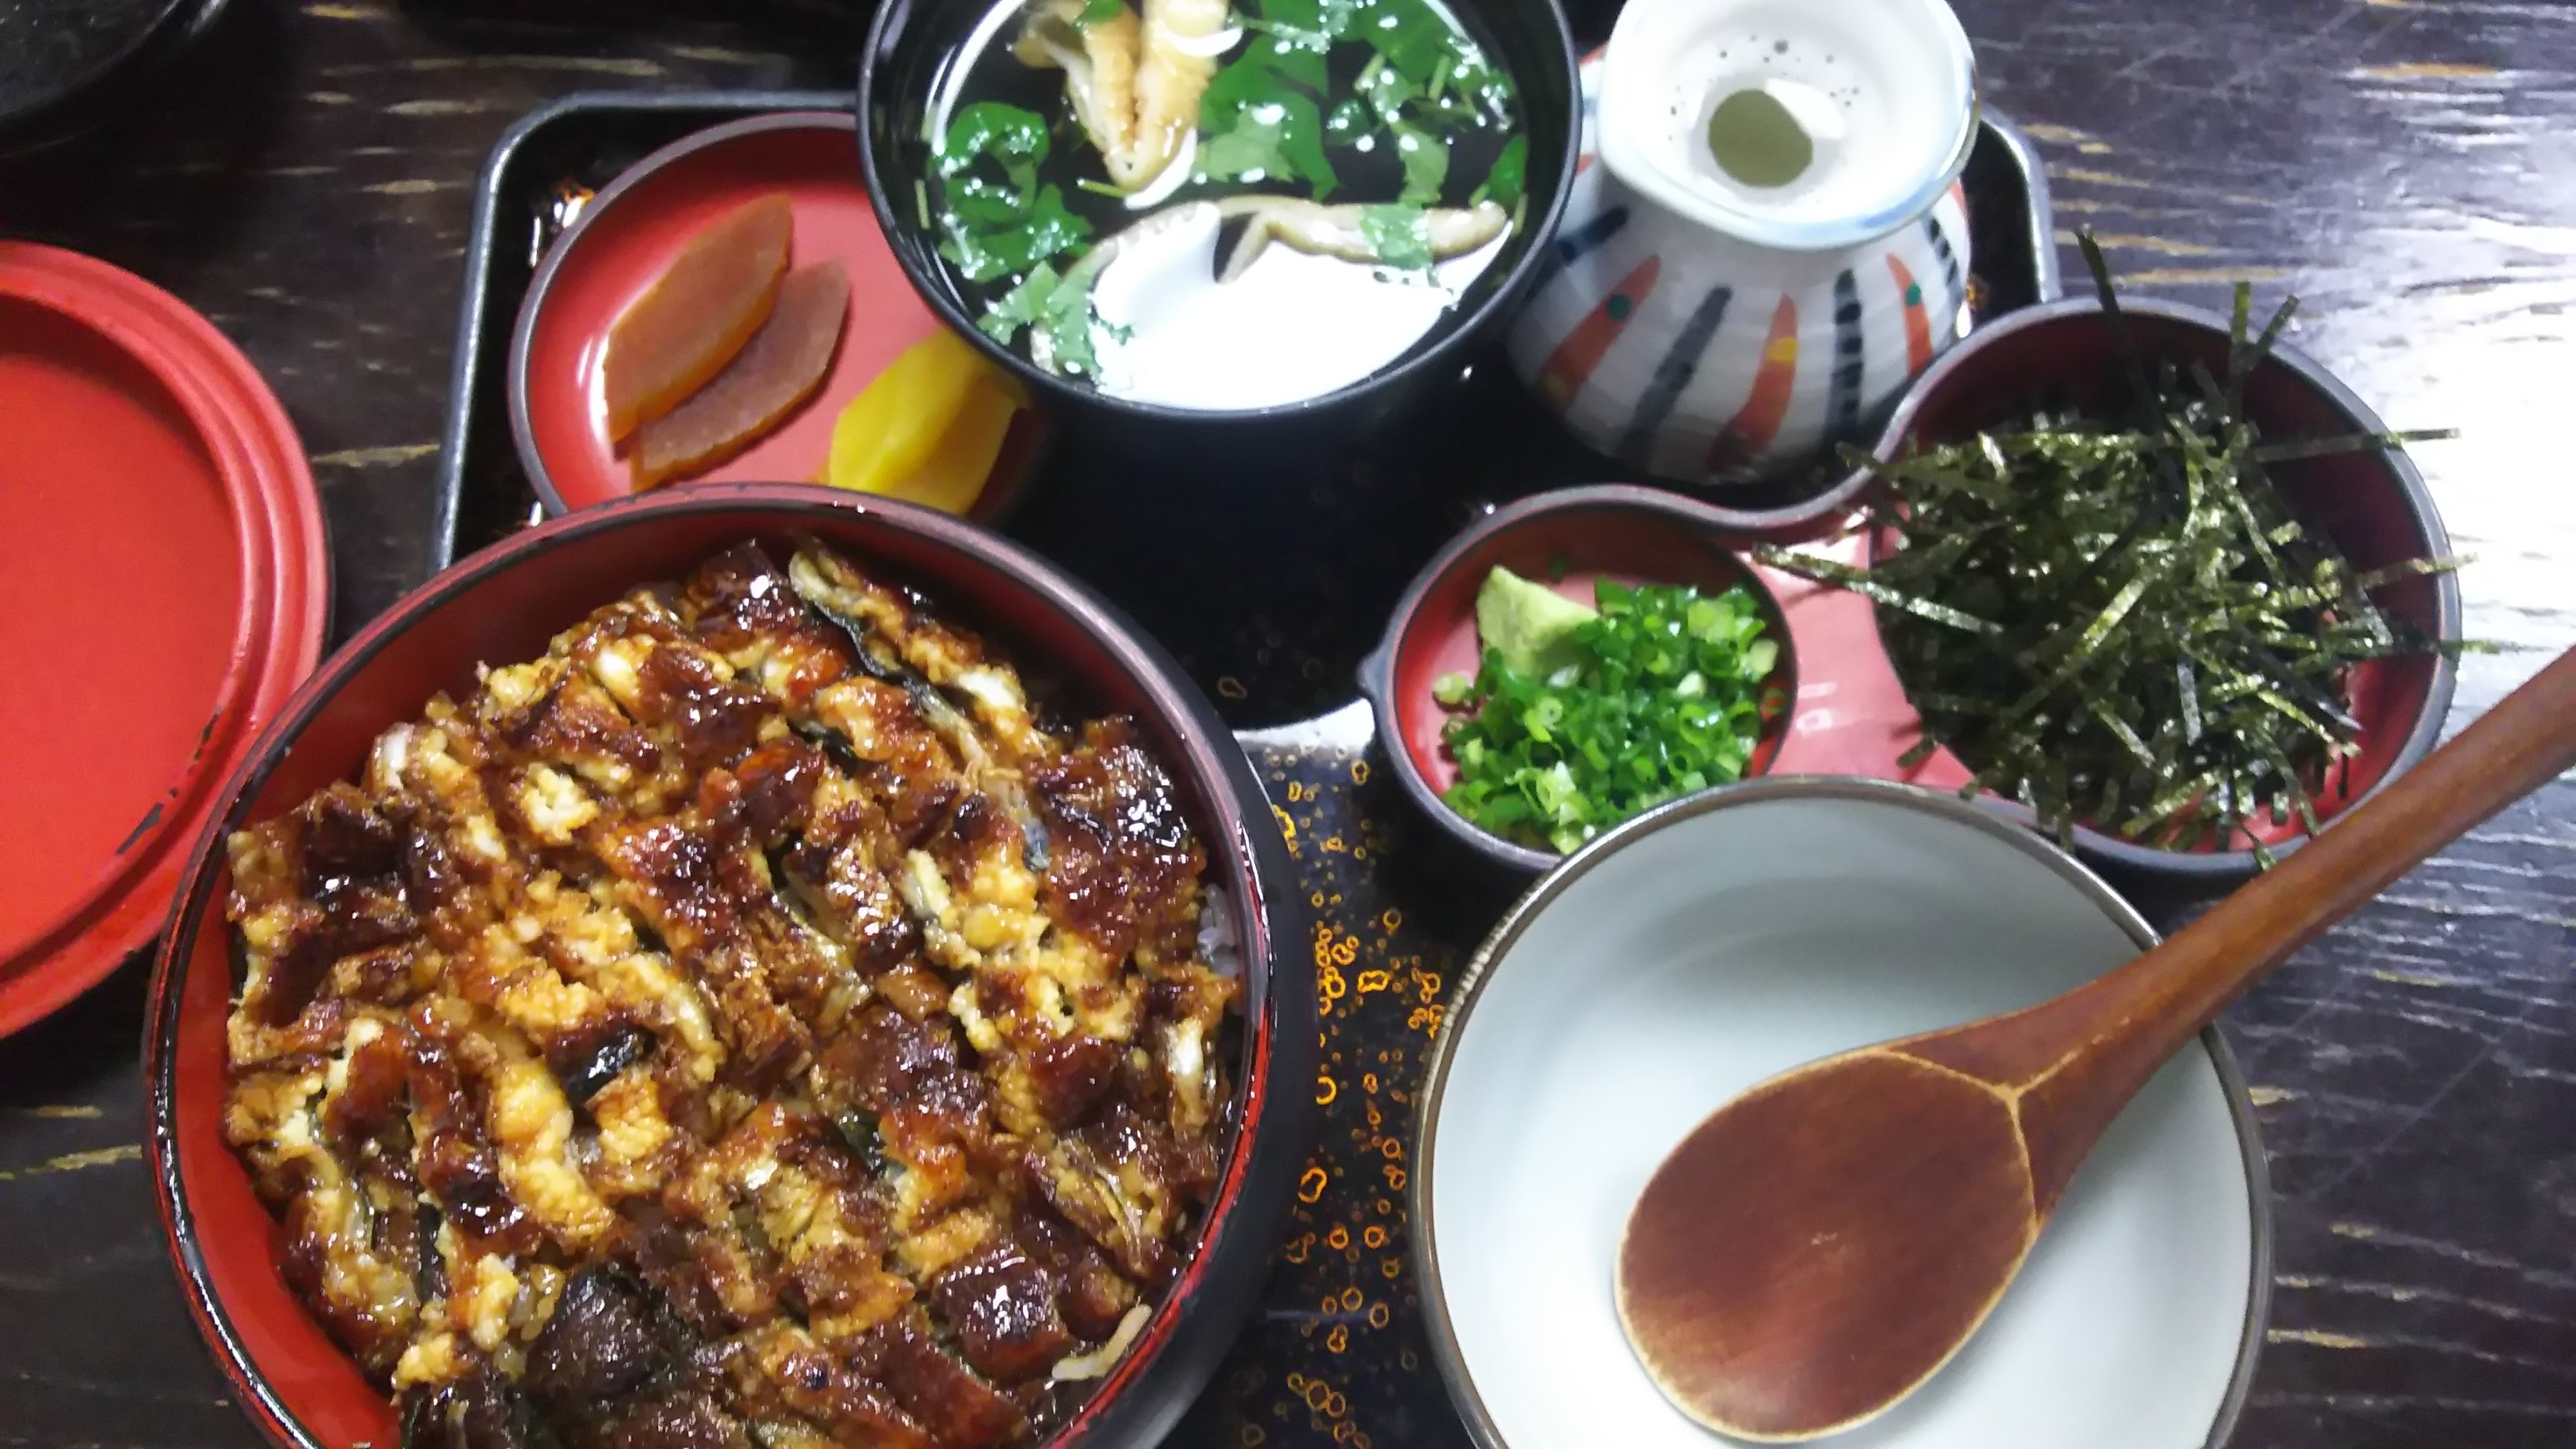 Hitsumabushi in Nagoya is a Japanese destination for foodies